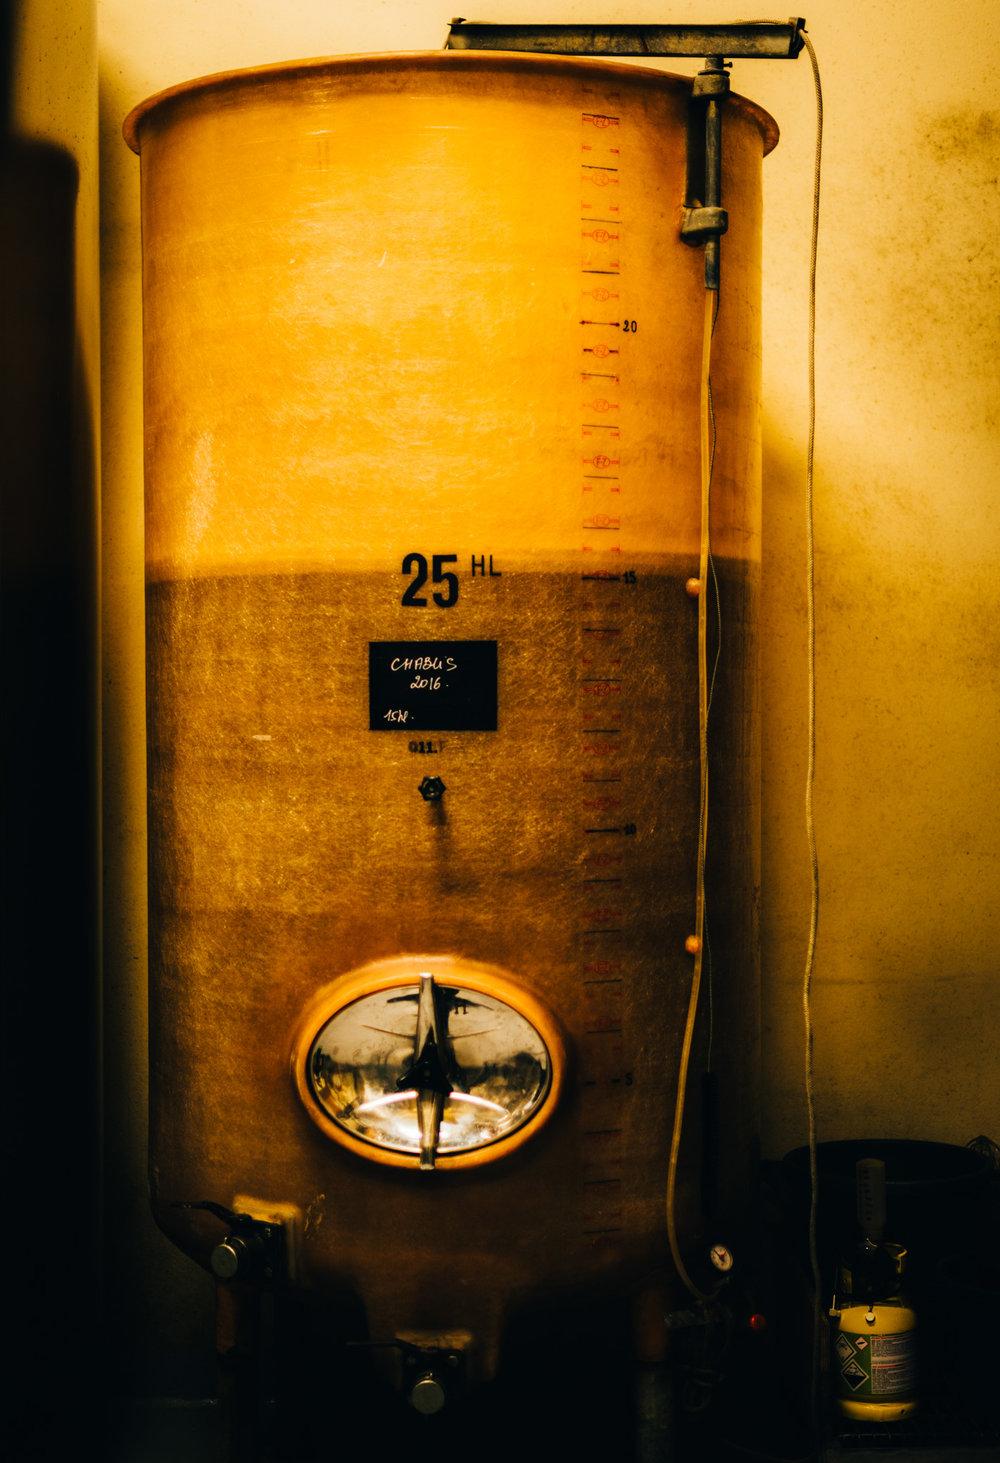 Burgundy : Chablis : Fermentation tank at Gilbert Picq